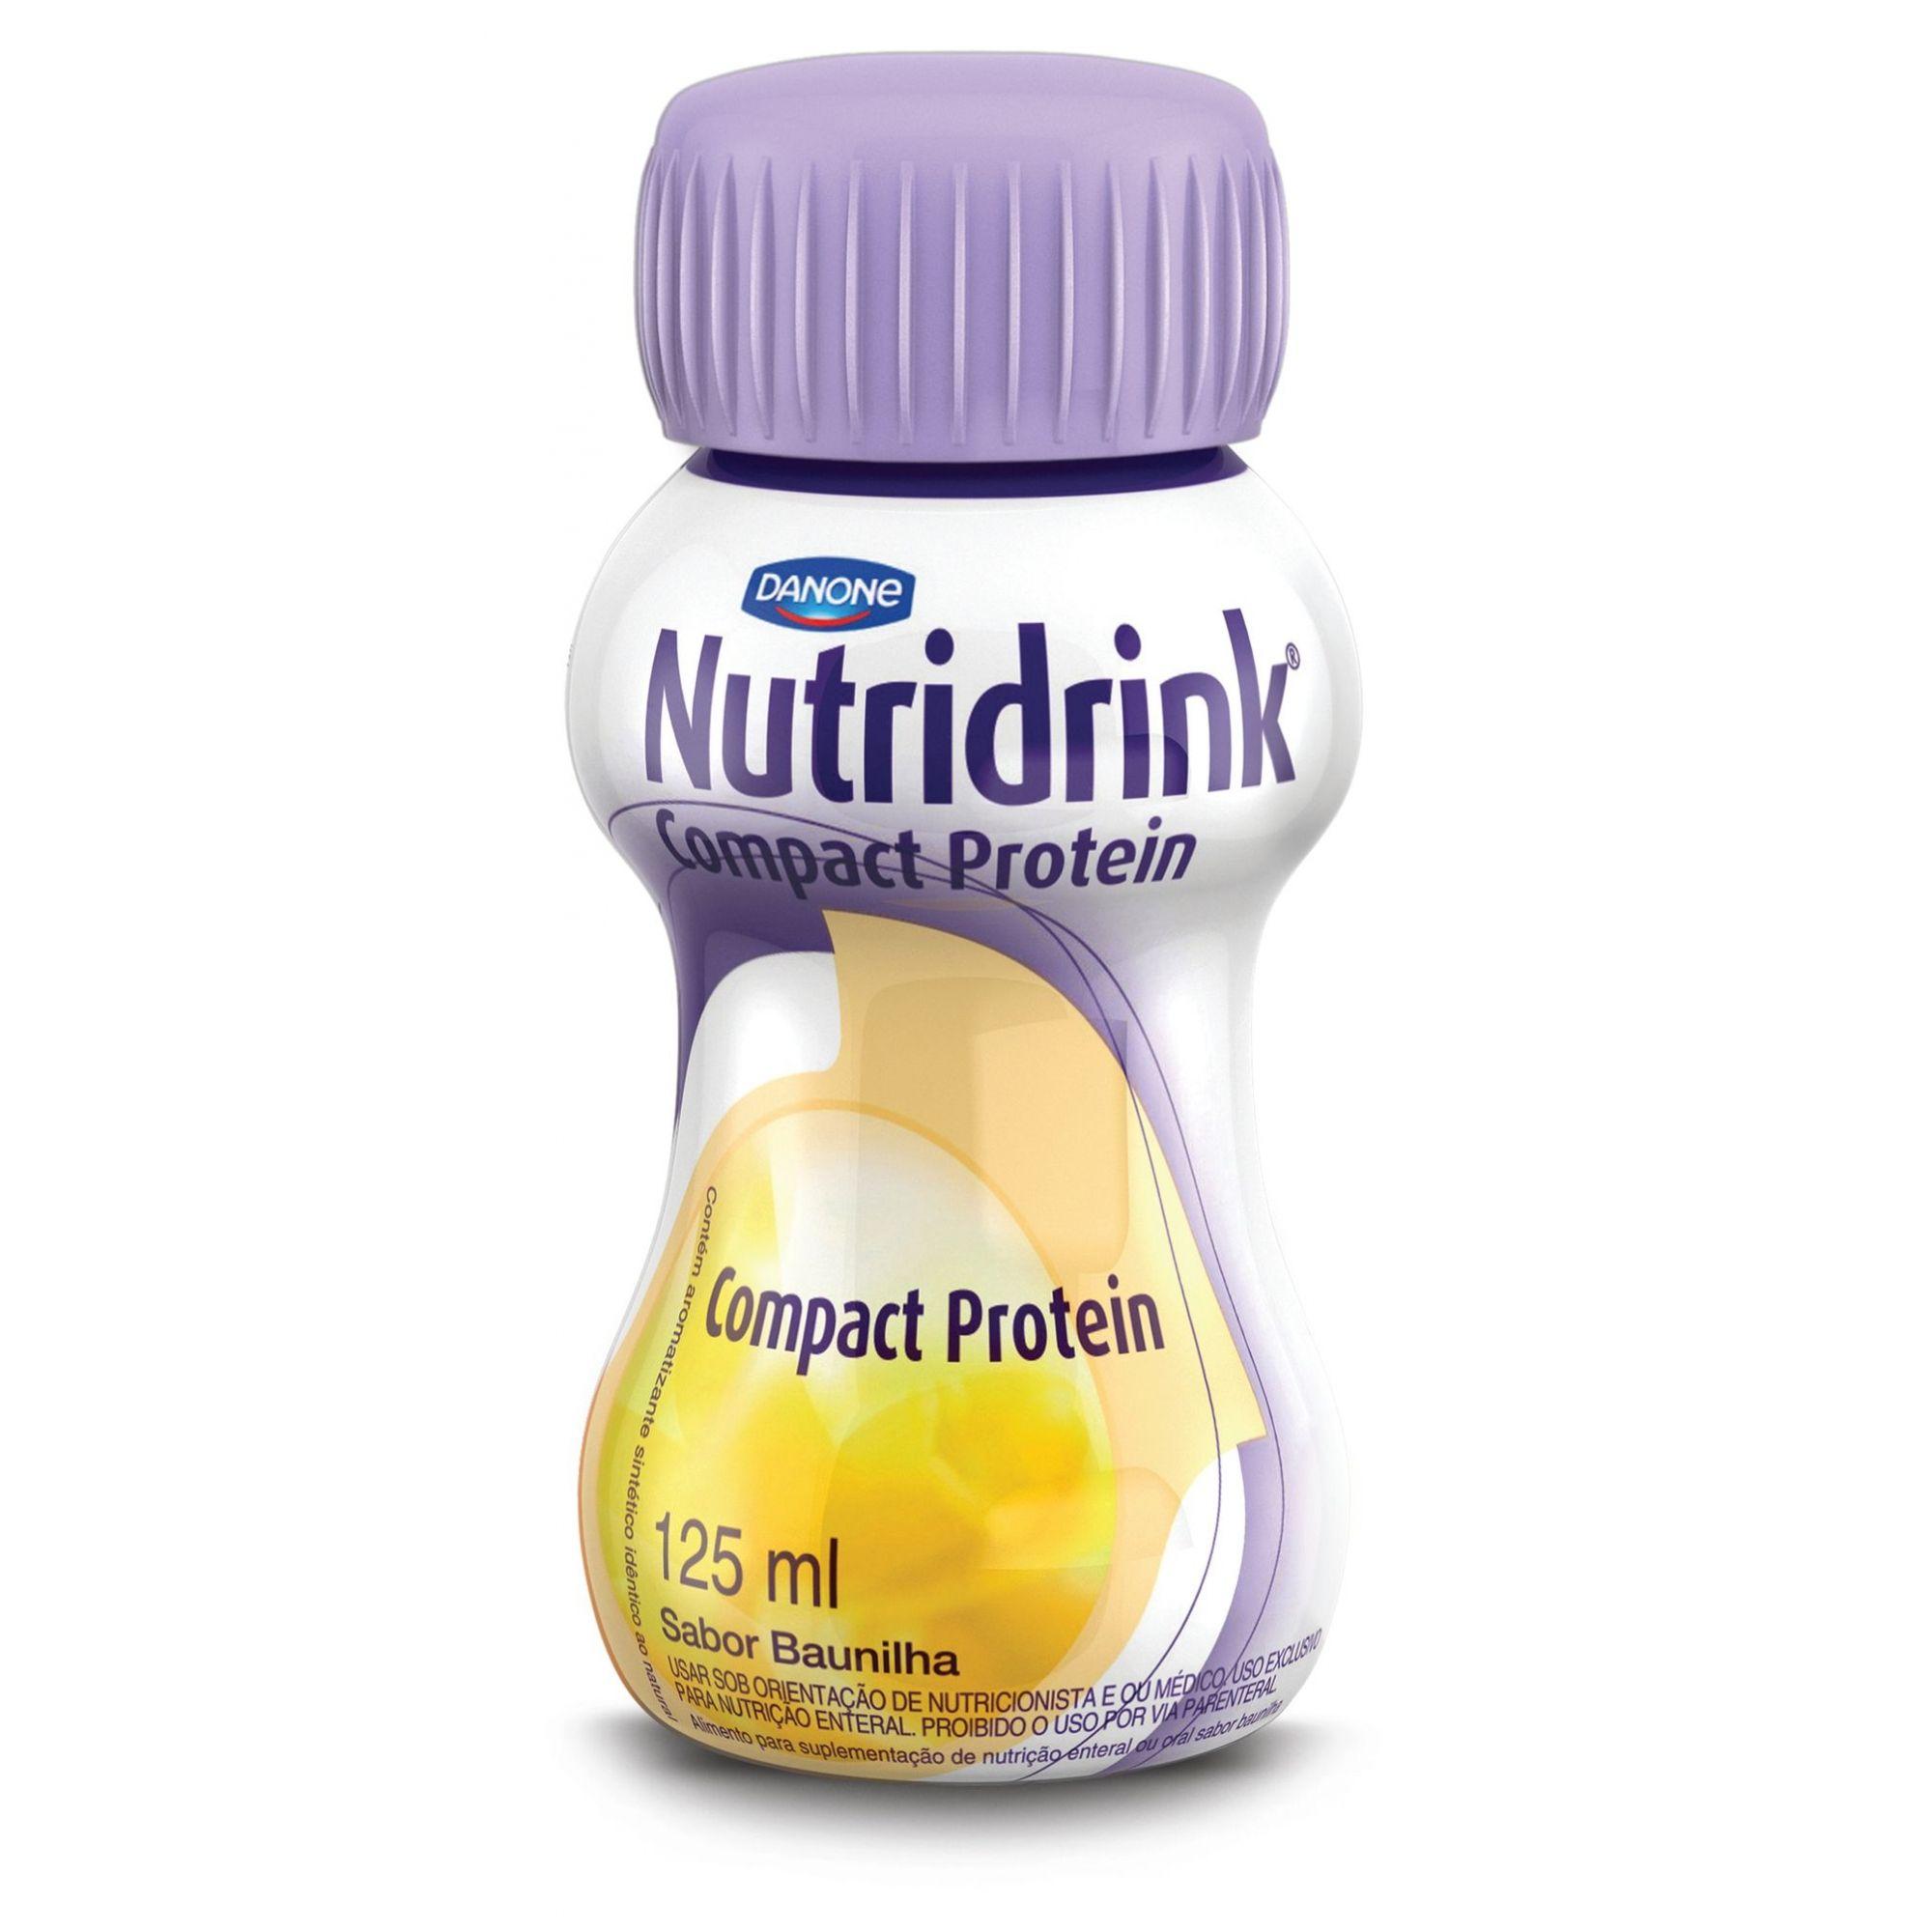 Nutridrink Compact Protein Baunilha - 125mL - (Danone)